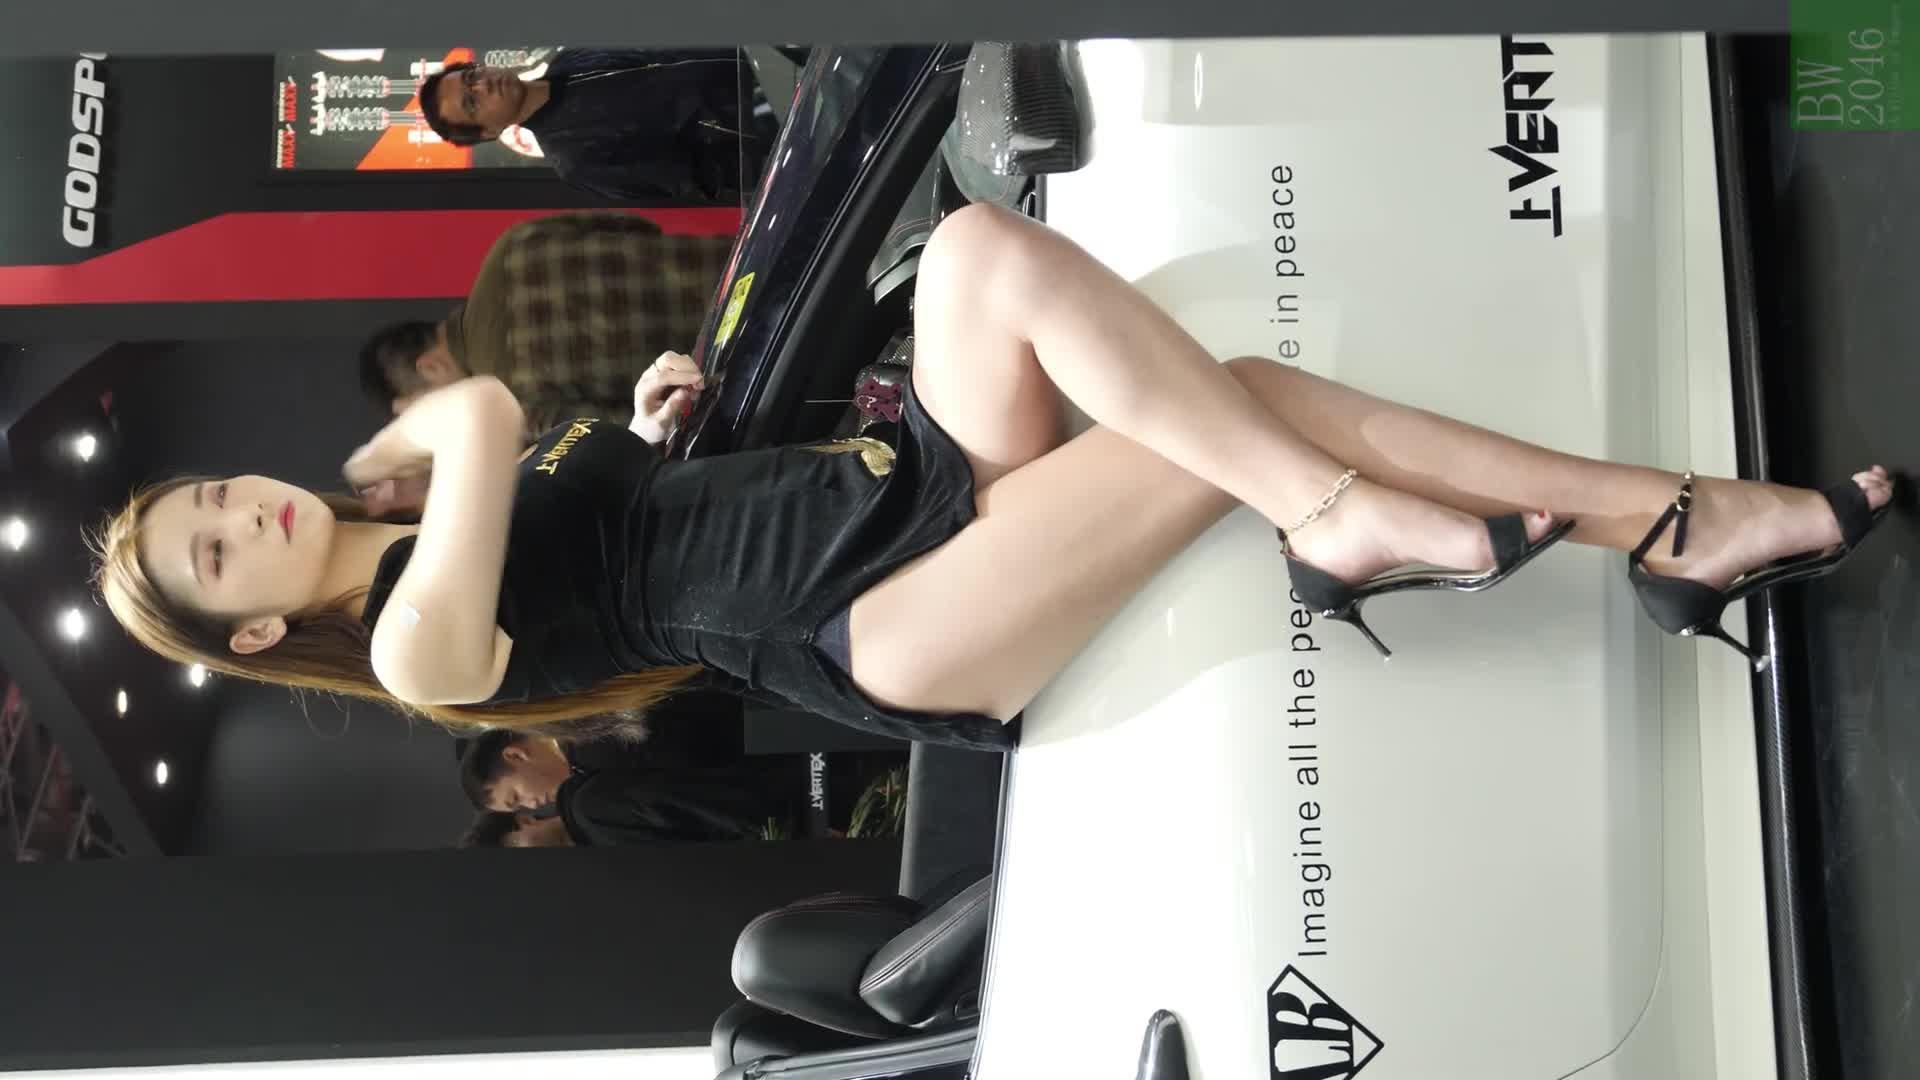 [4K] CAS 改裝車展 | China Auto Salon 2019 - Racing Model 레이싱모델 車模 #42 @ VERTEX Rental 上壹出行 (Horizontal)